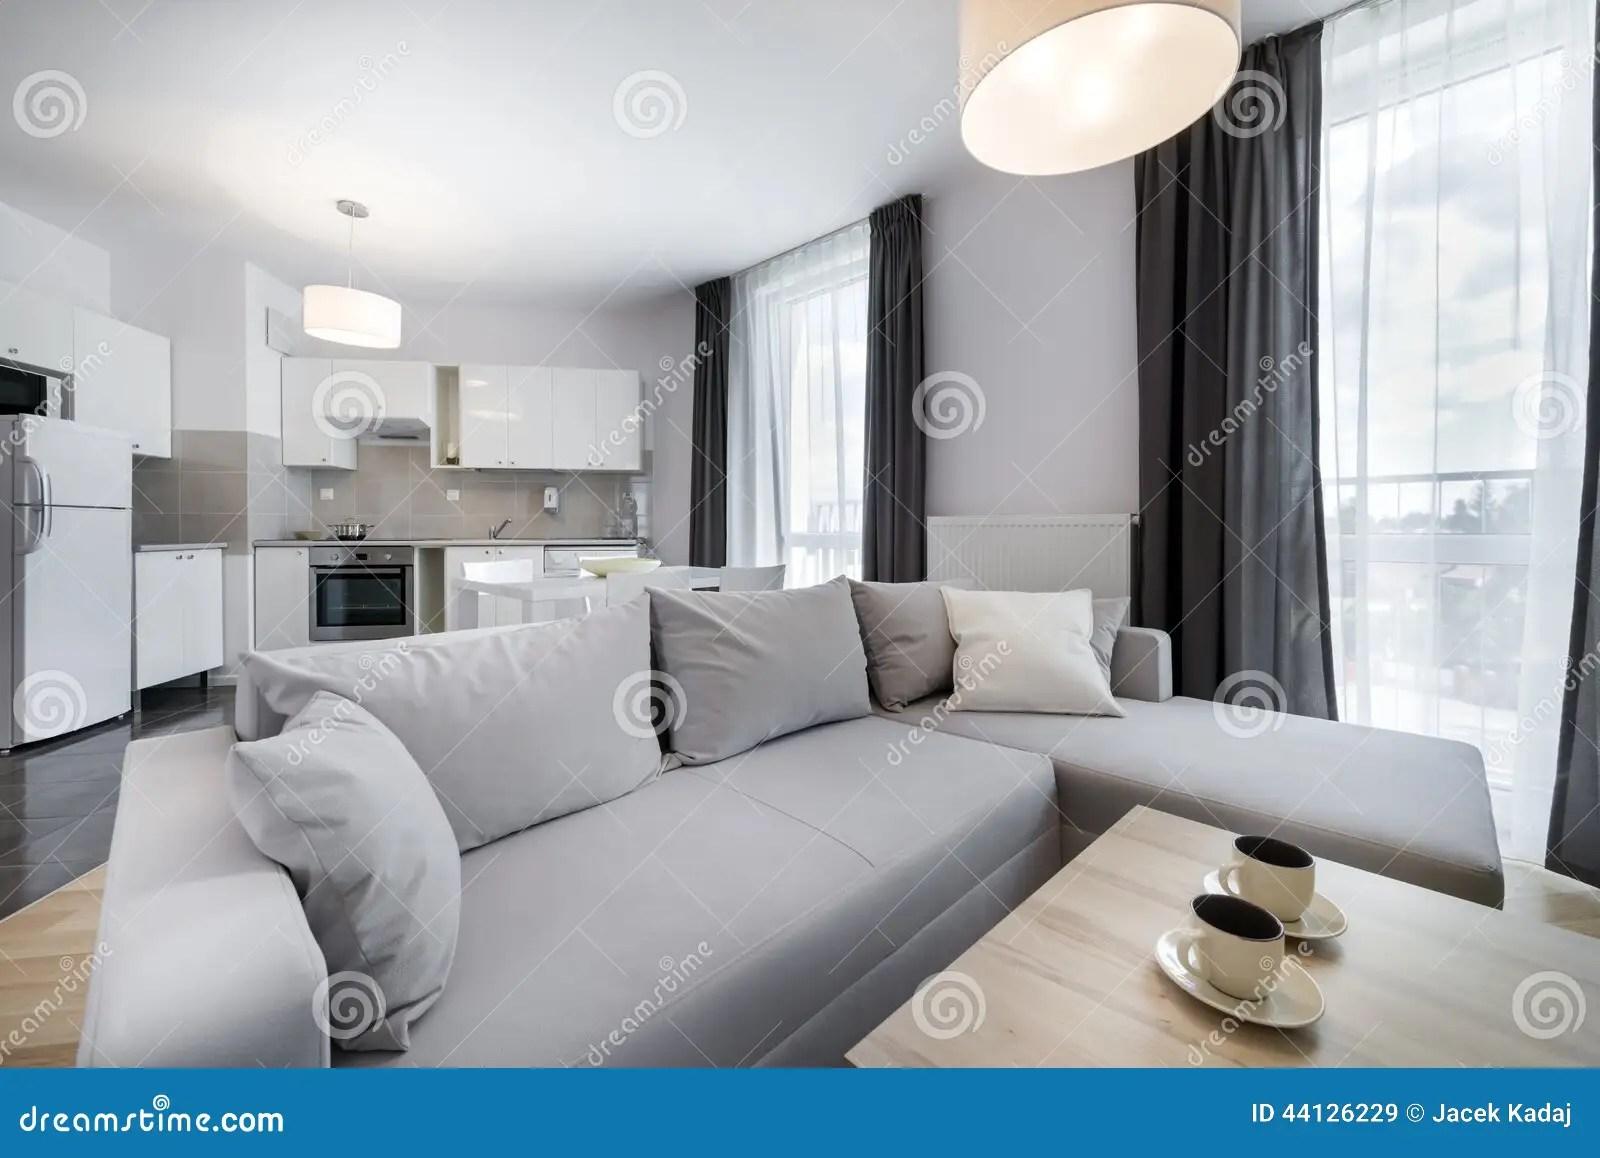 Modern Interior Design Living Room In Scandinavian Style Stock Photo Image 44126229